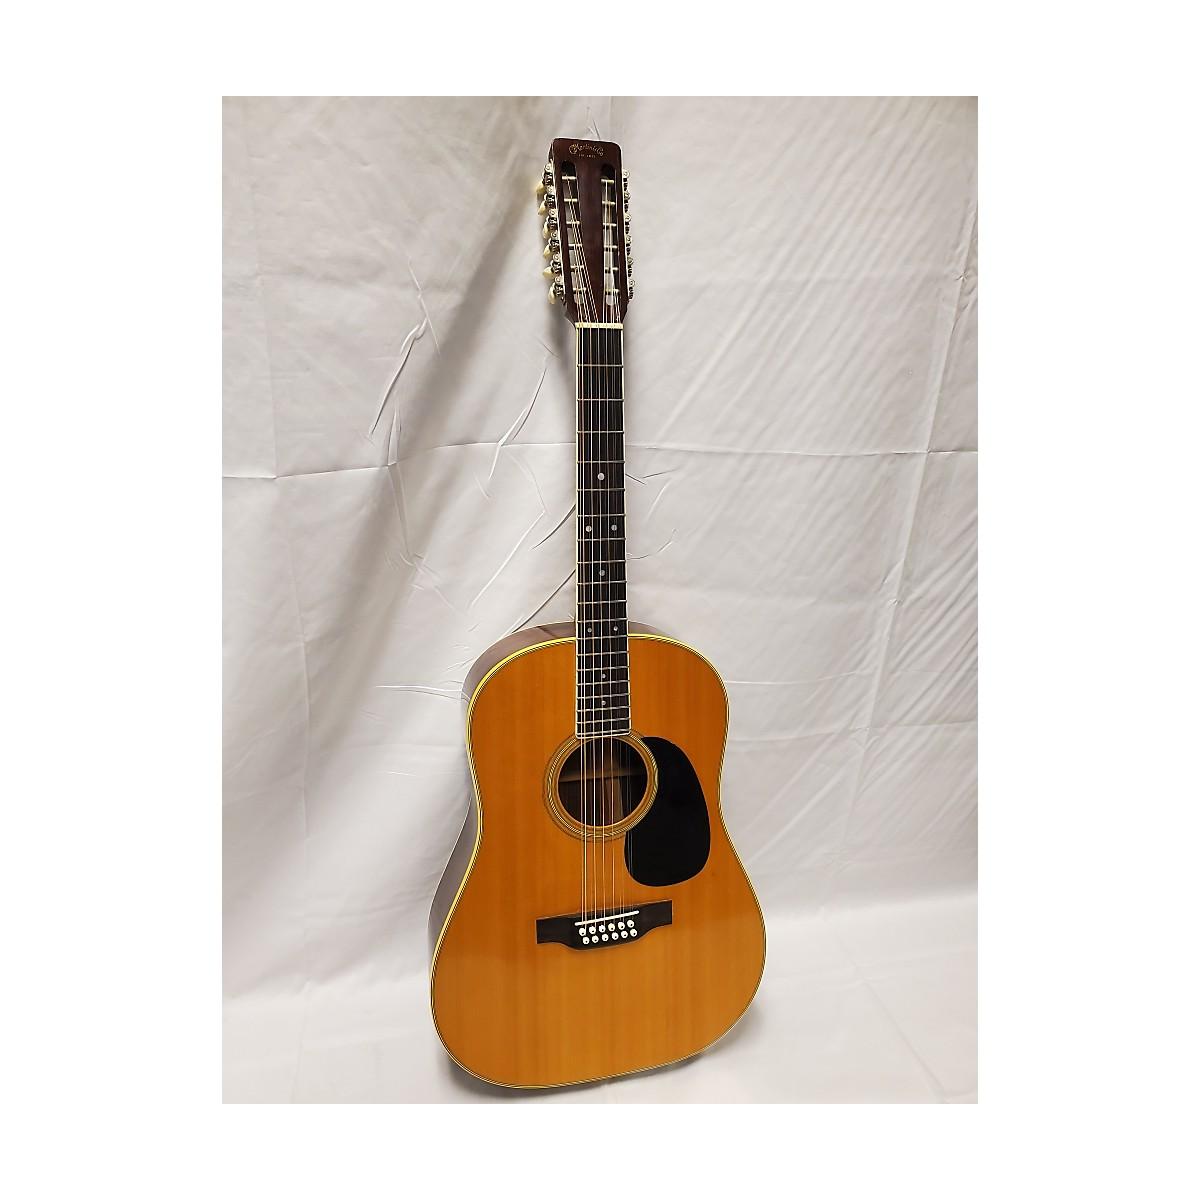 Martin 1969 D12-35 12 String Acoustic Guitar